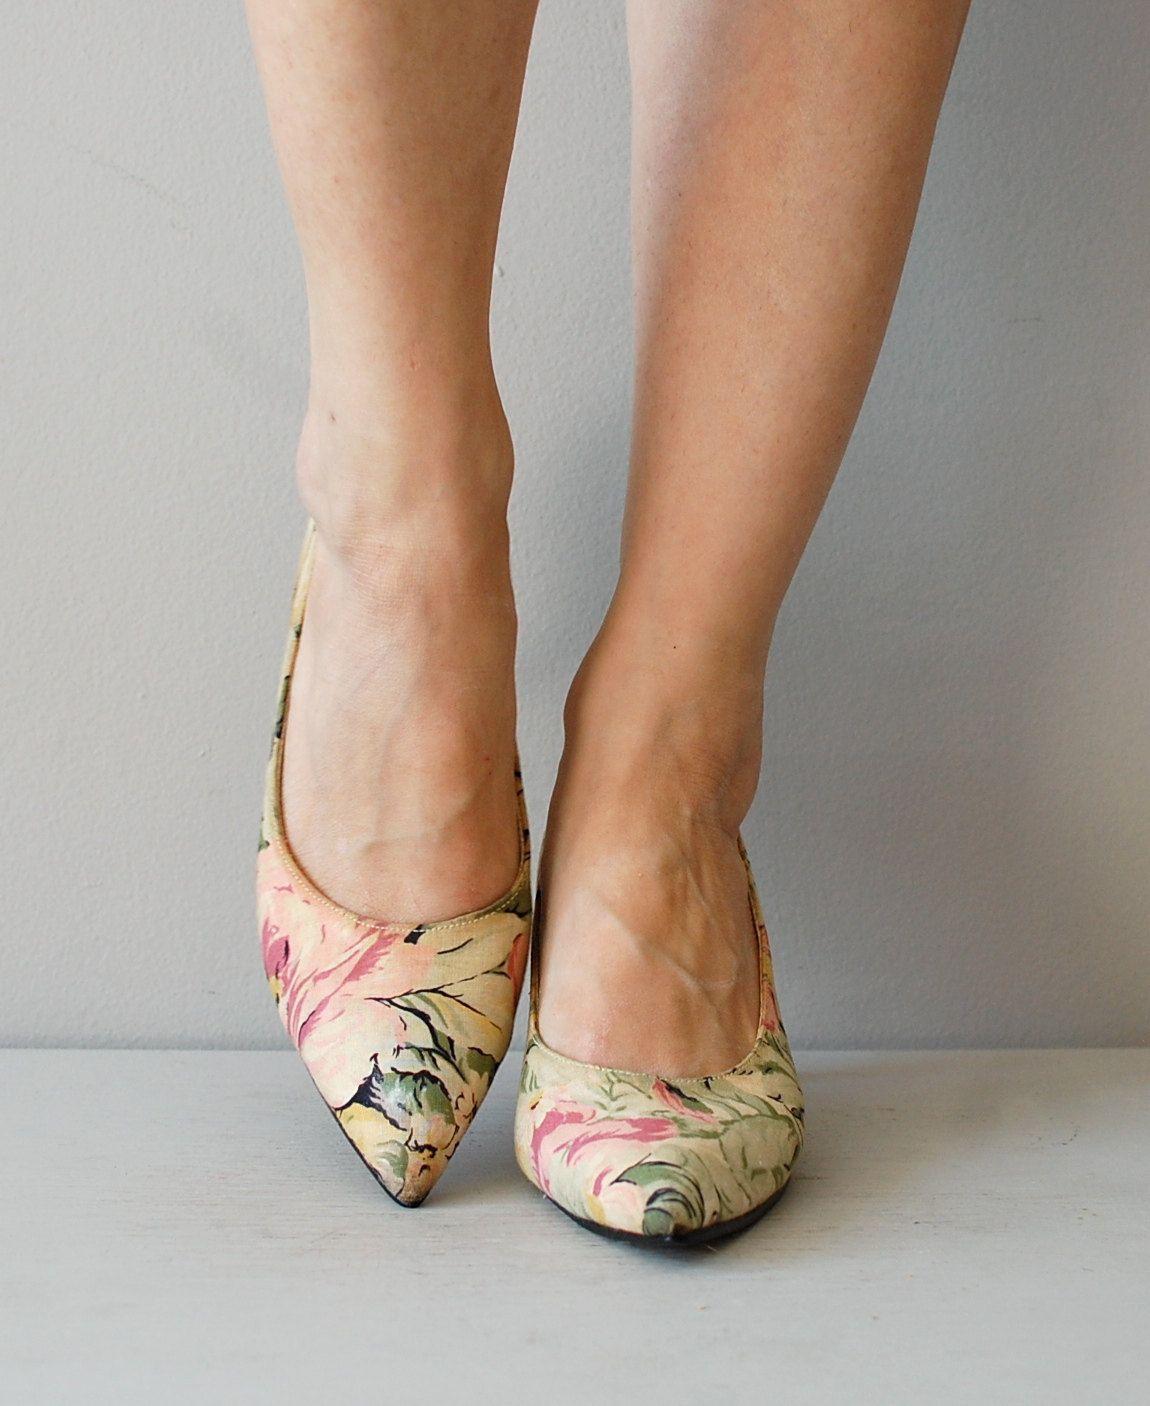 e8c65855bcd8ee floral linen shoes   floral kitten heels   pastel floral heels. DearGolden  via Etsy.